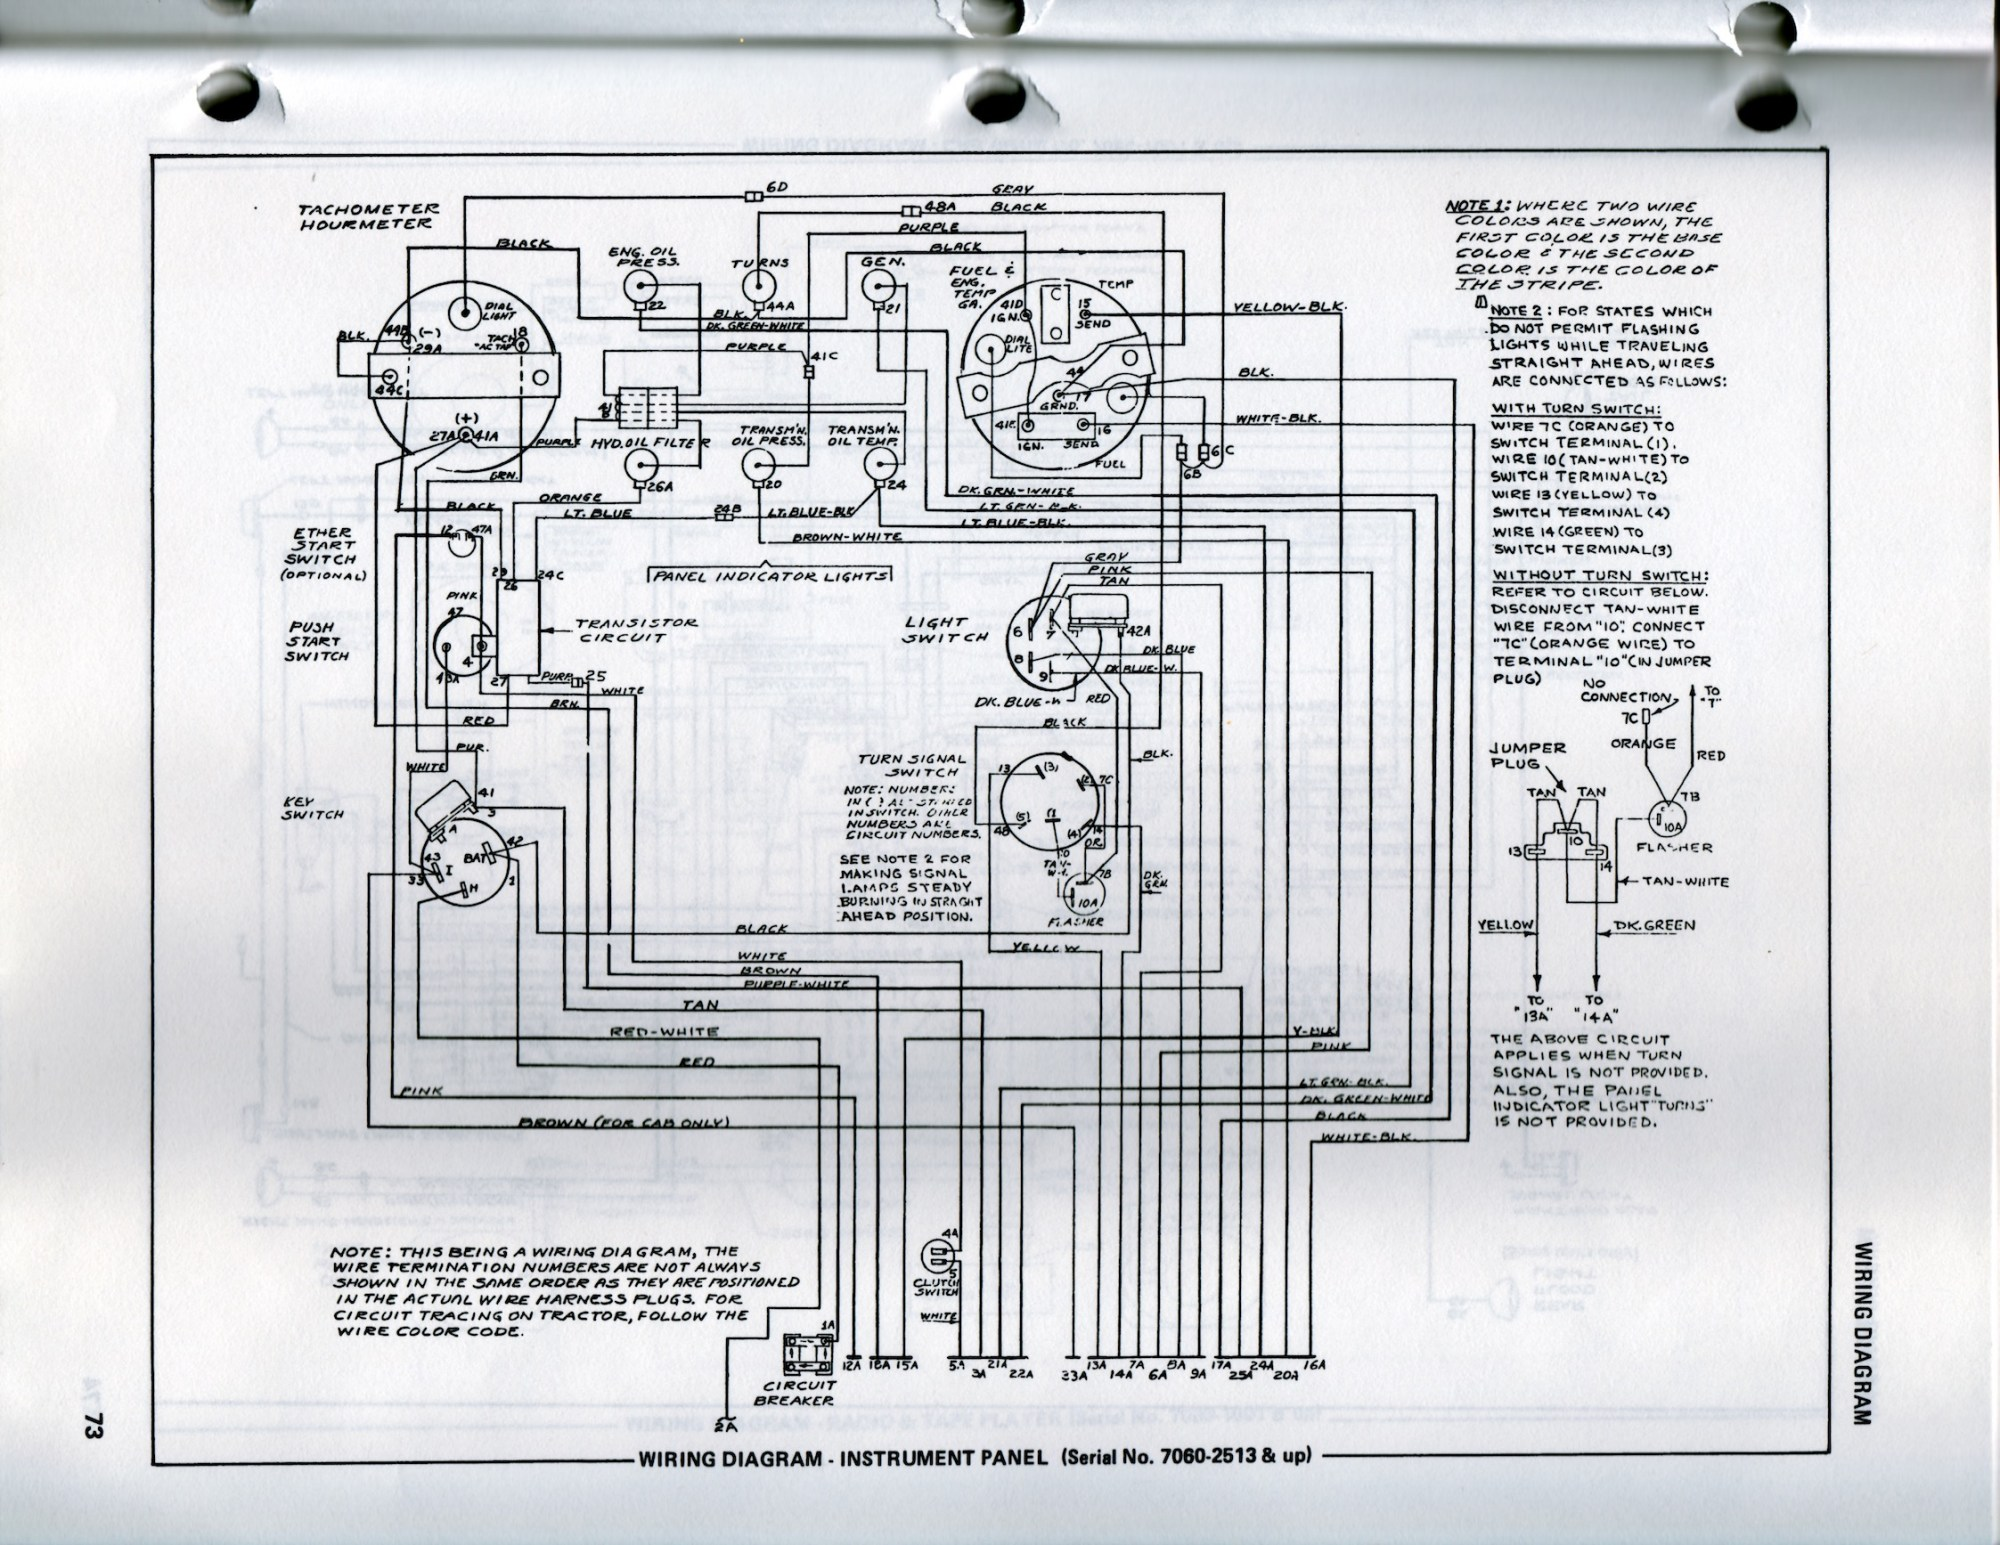 7060 Alli Chalmer Wiring Diagram - 611 allis chalmers wiring ... Voltage Regulator Wiring Diagram Allis Chalmers D on